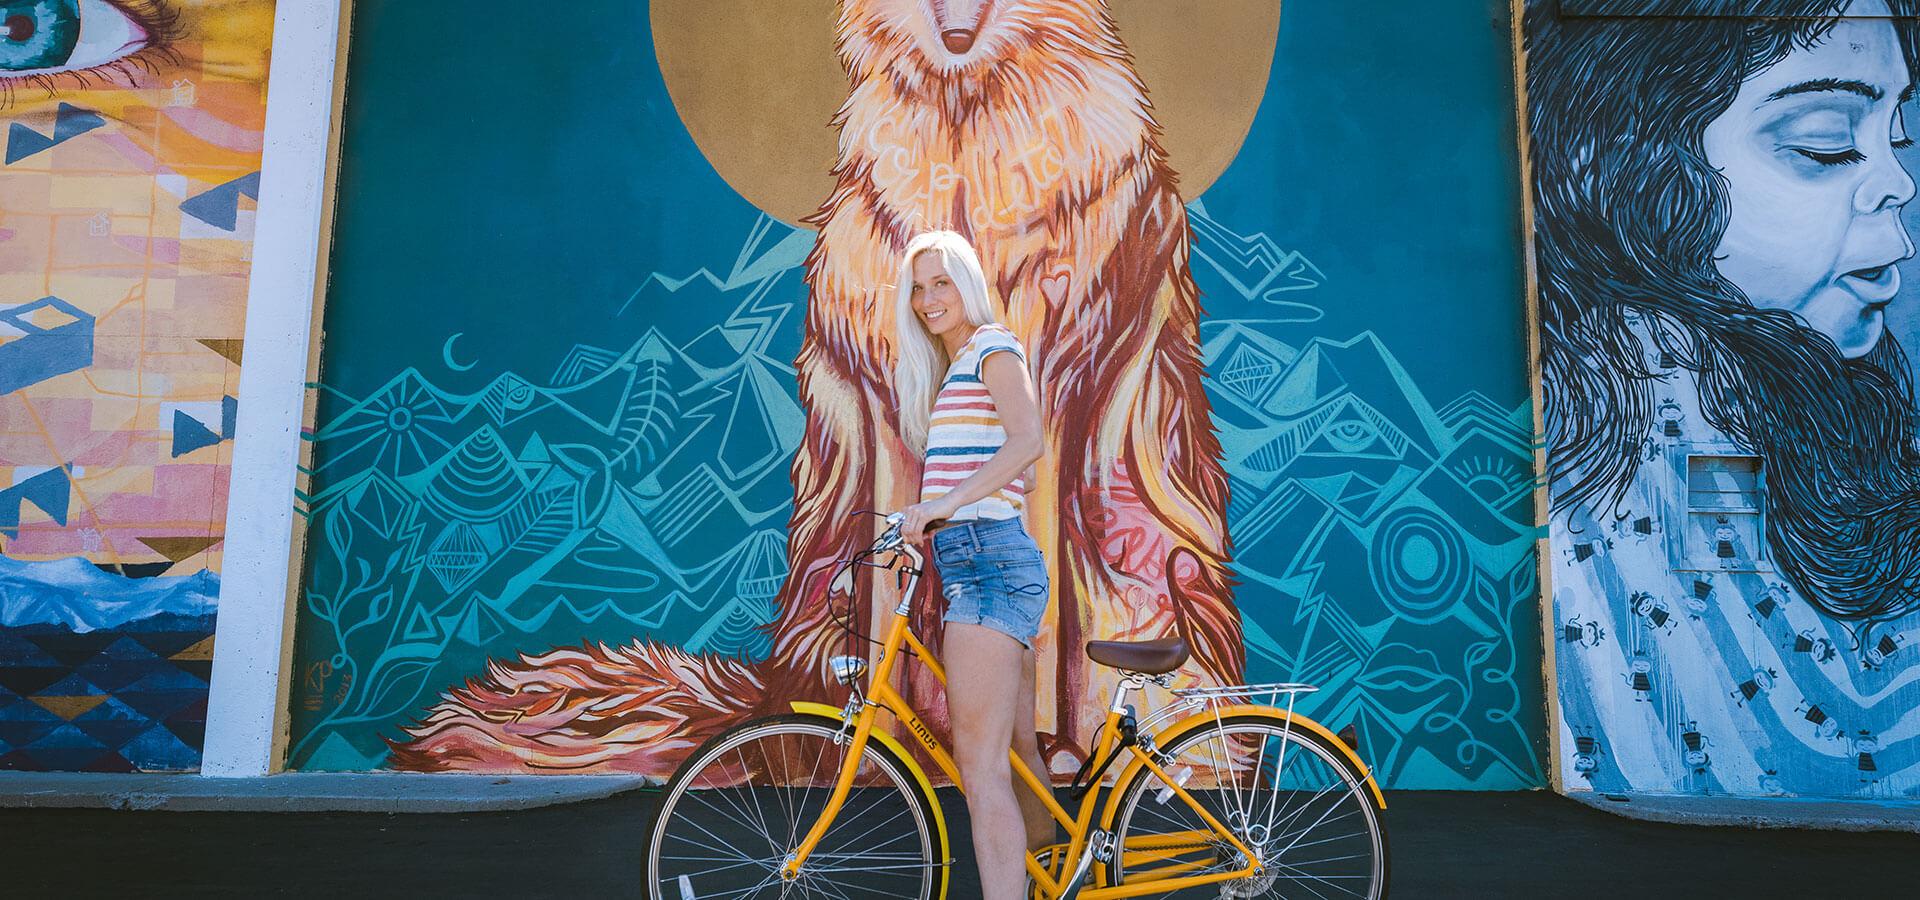 Biking and Murals Downtown Reno